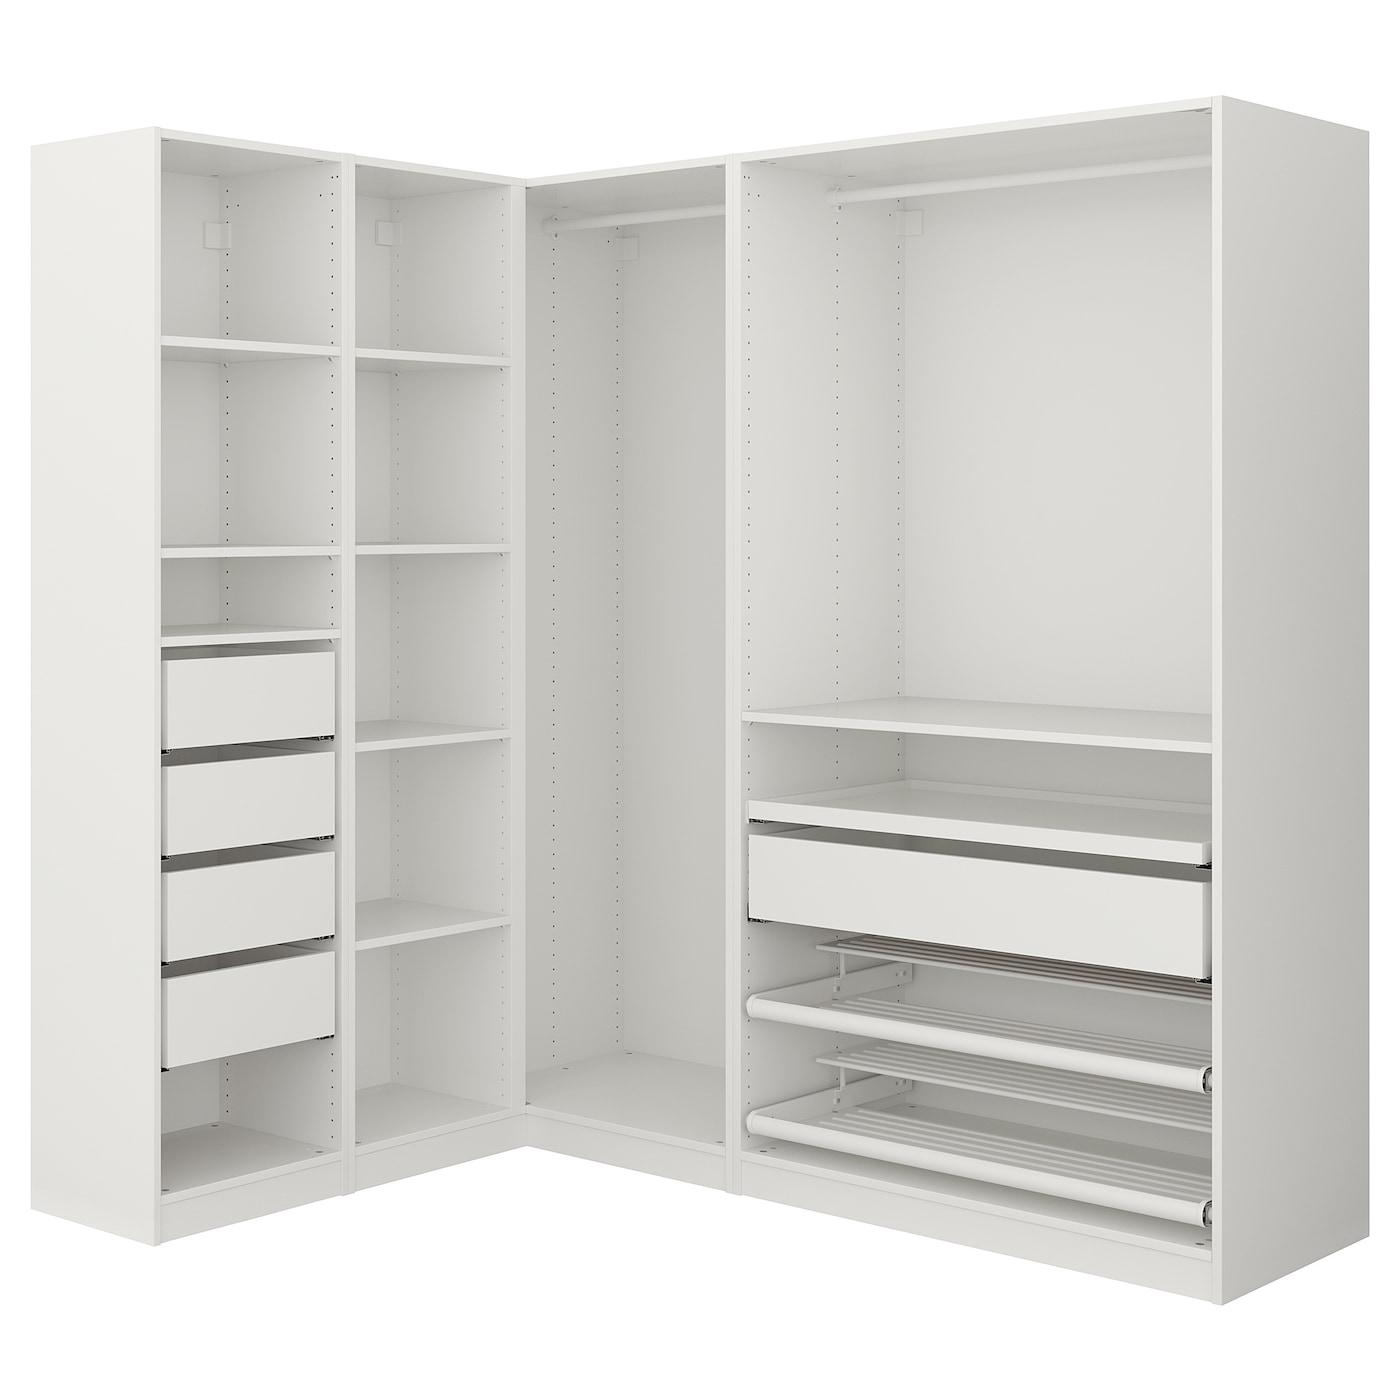 pax corner wardrobe white 160 188 x 201 cm ikea. Black Bedroom Furniture Sets. Home Design Ideas